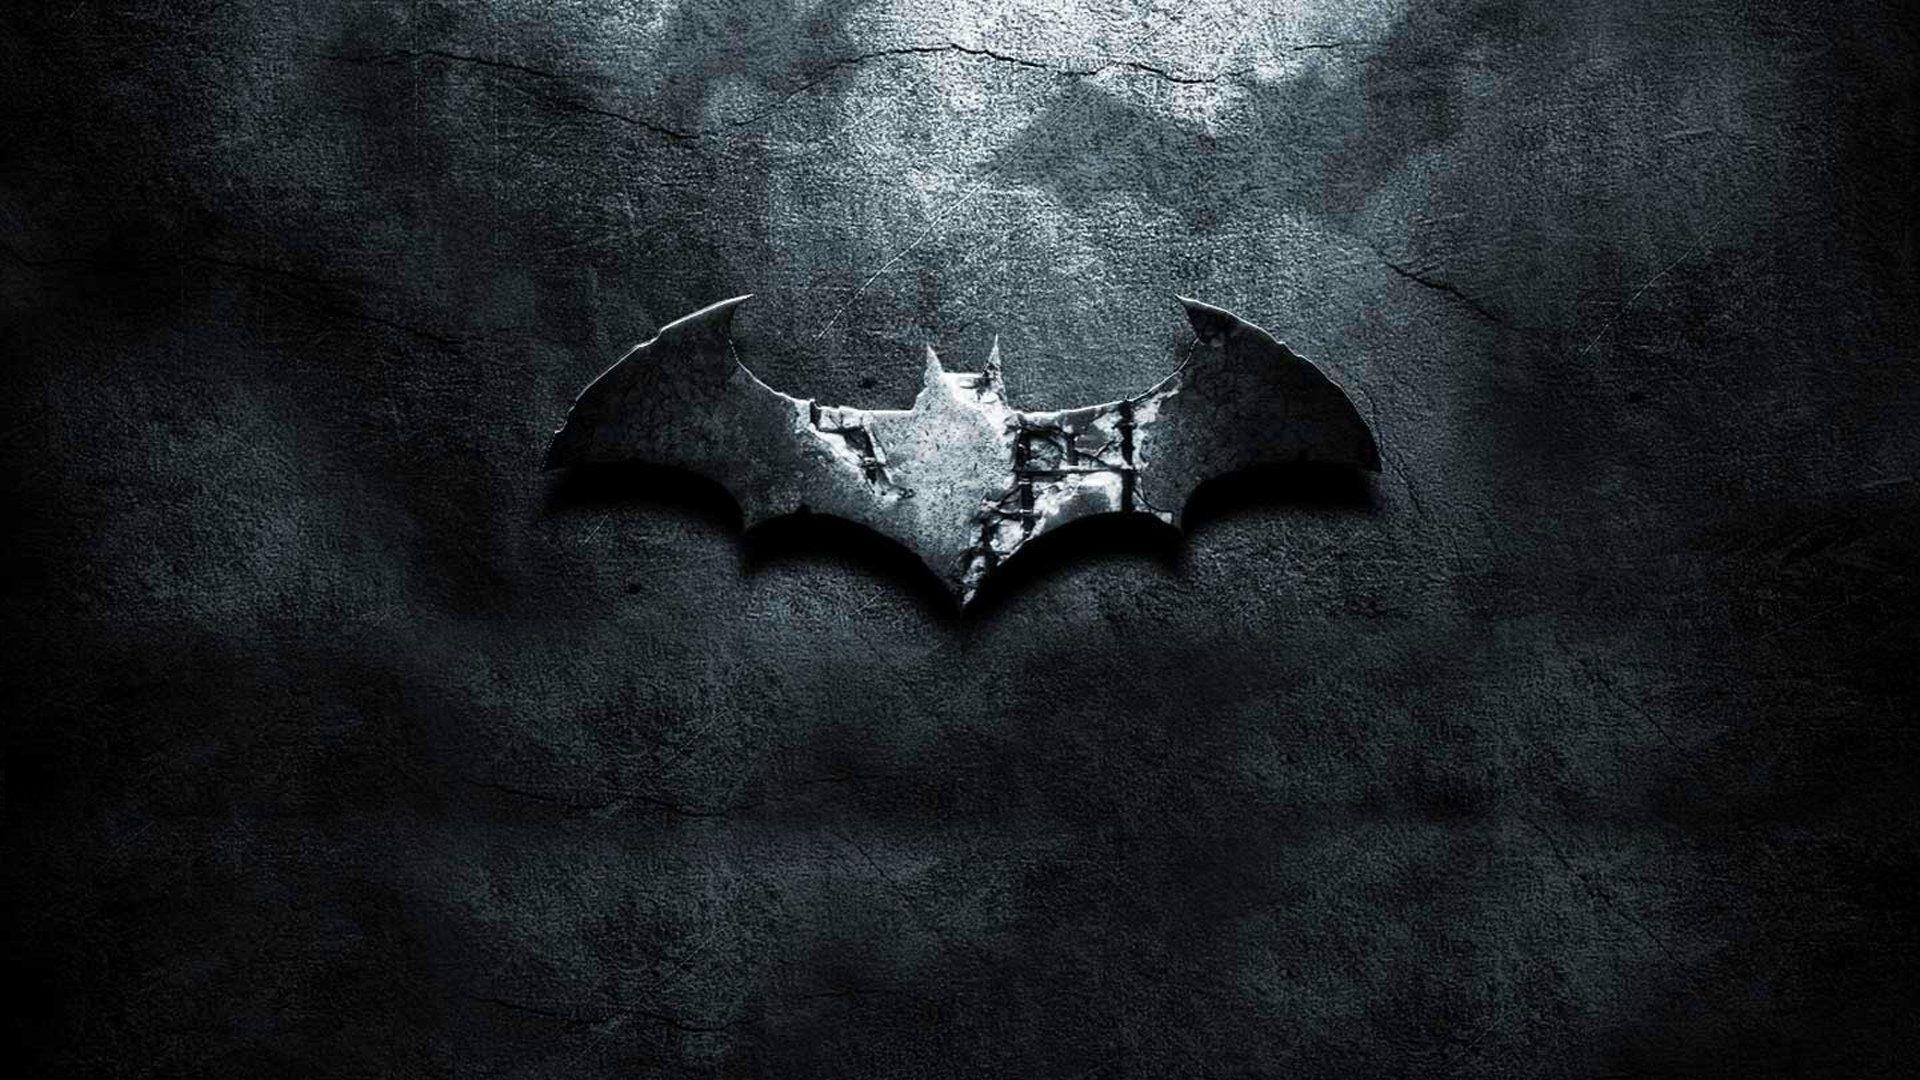 Batman Logo Wallpaper 1 Download Free Amazing High Resolution